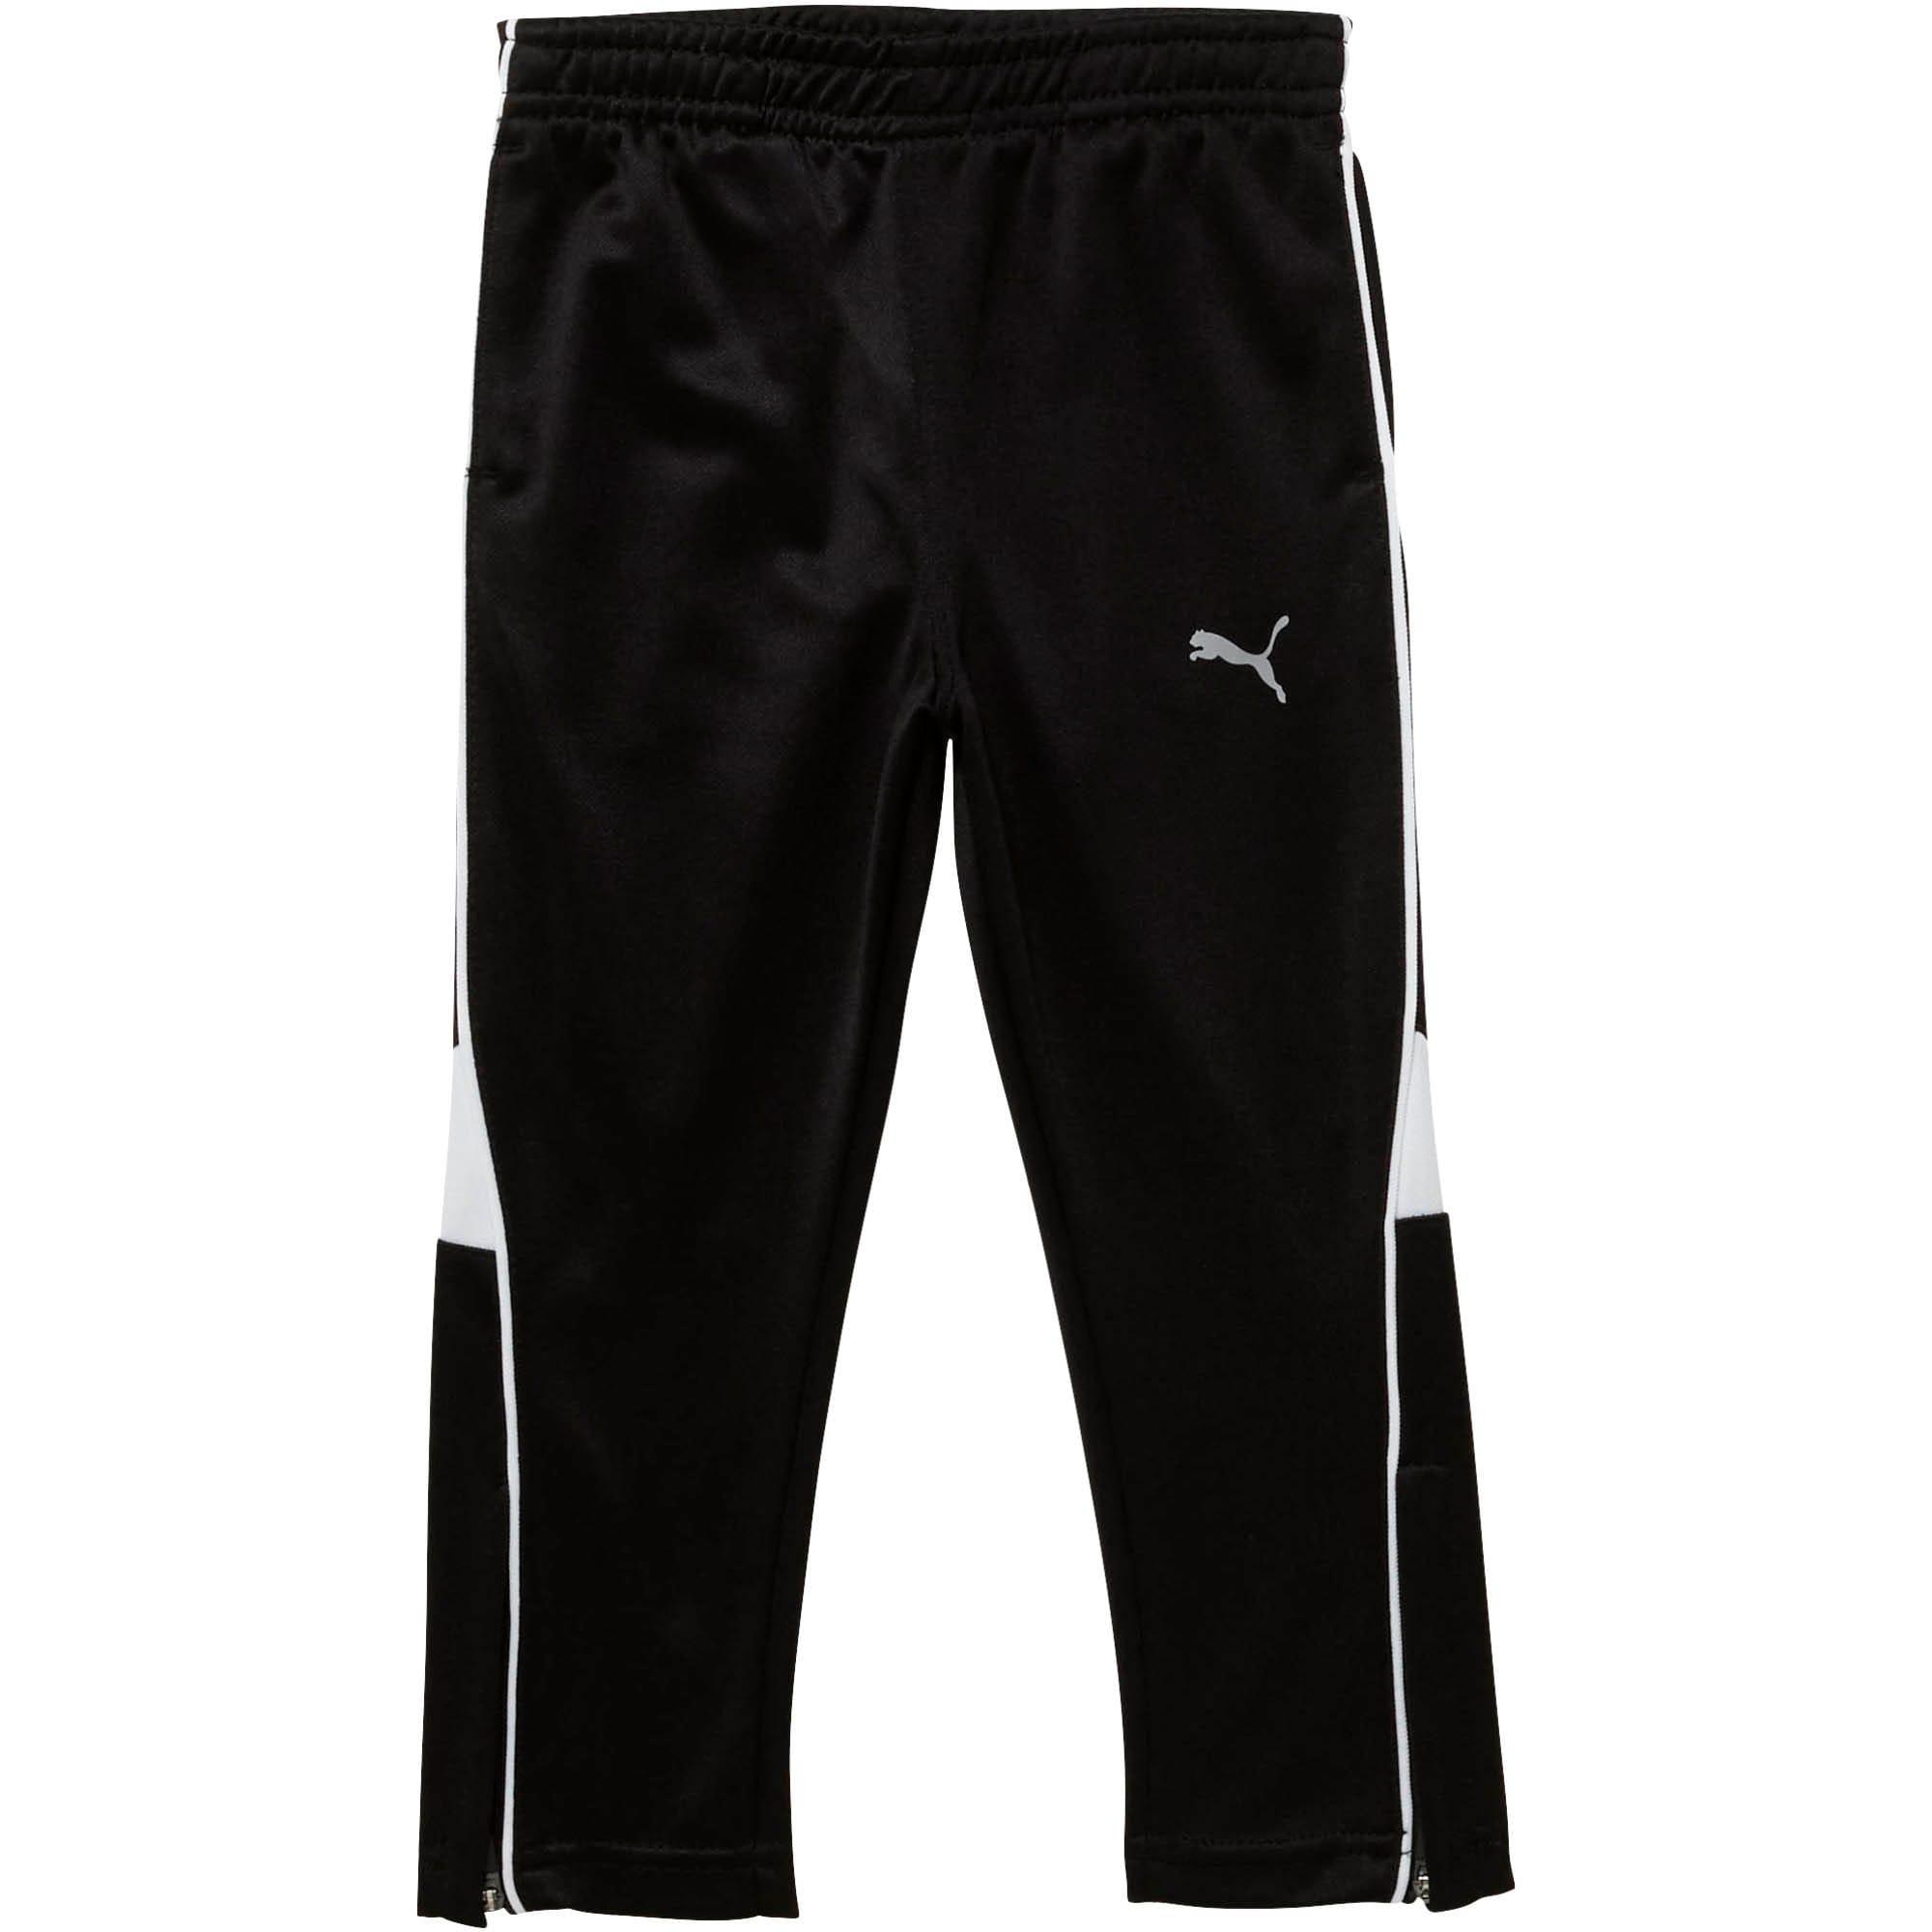 Thumbnail 1 of Toddler Soccer Pants, puma black, medium